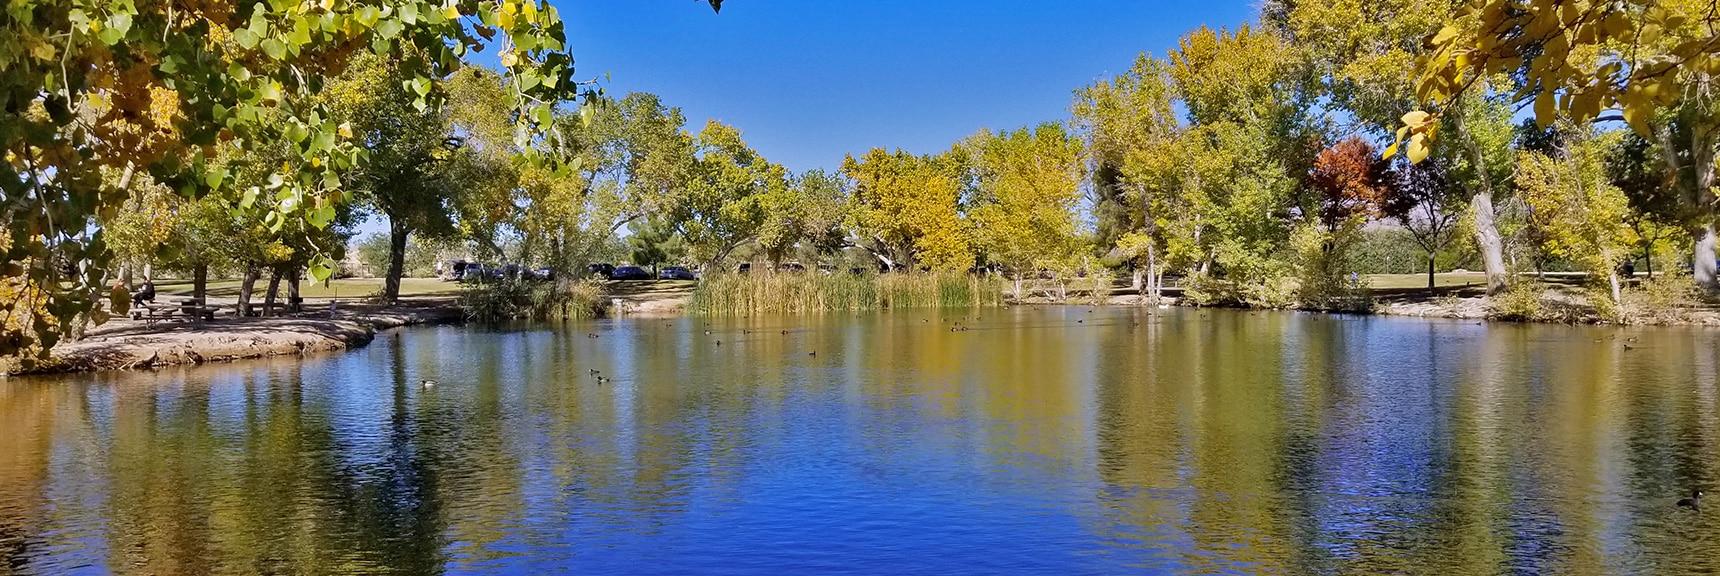 Tule Lake at Floyd Lamb Park   Centennial Hills Mountain Bike Conditioning Adventure Loop, Las Vegas, Nevada